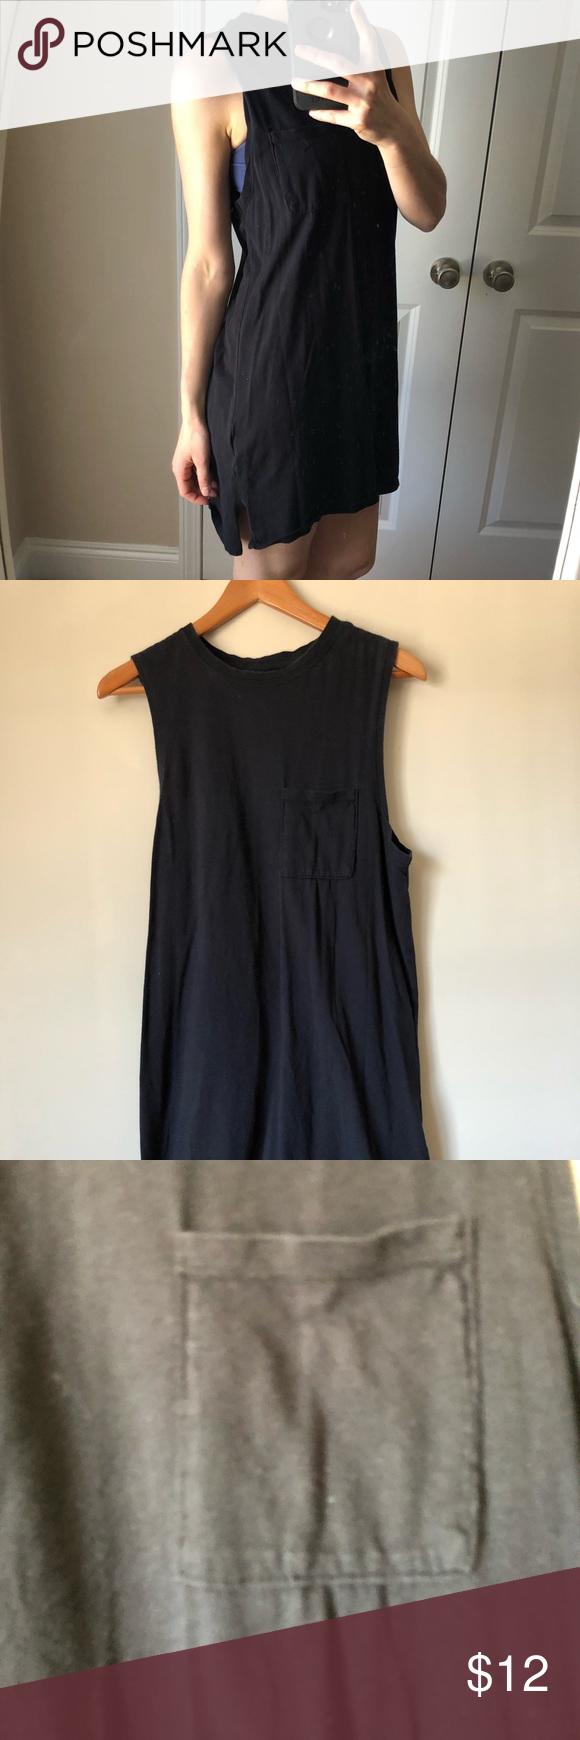 Is a black dress ok to wear to a wedding  Urban outfitters black mini tshirt dress  My Posh picks